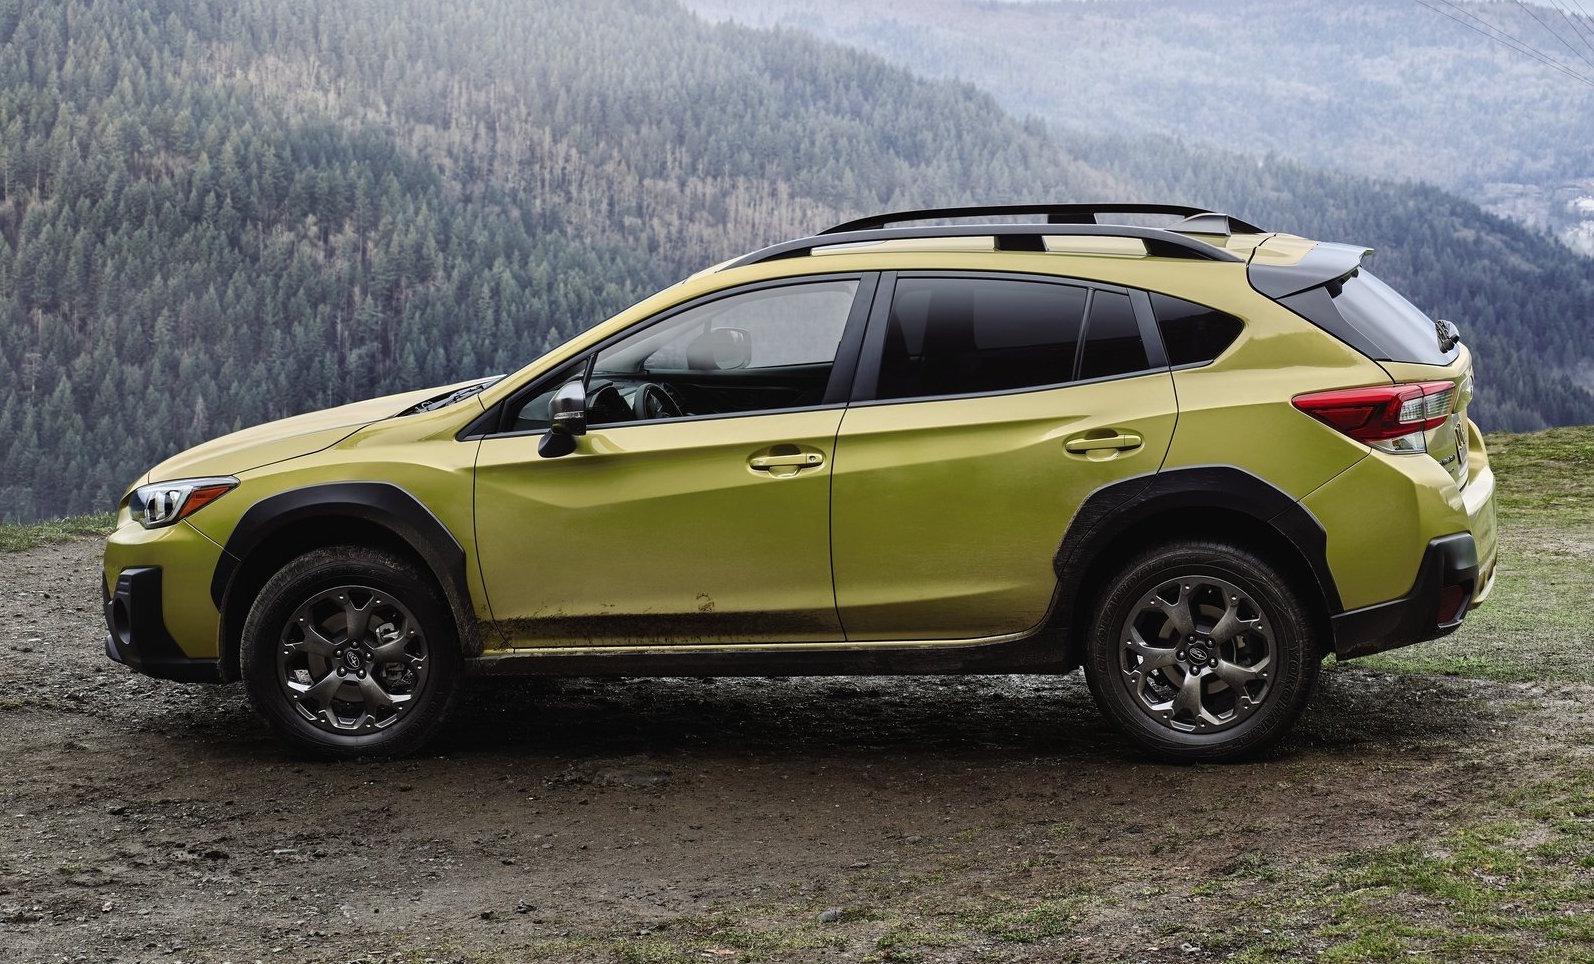 2021 Subaru Crosstrek debuts 2.5L engine option, not for Australia  PerformanceDrive